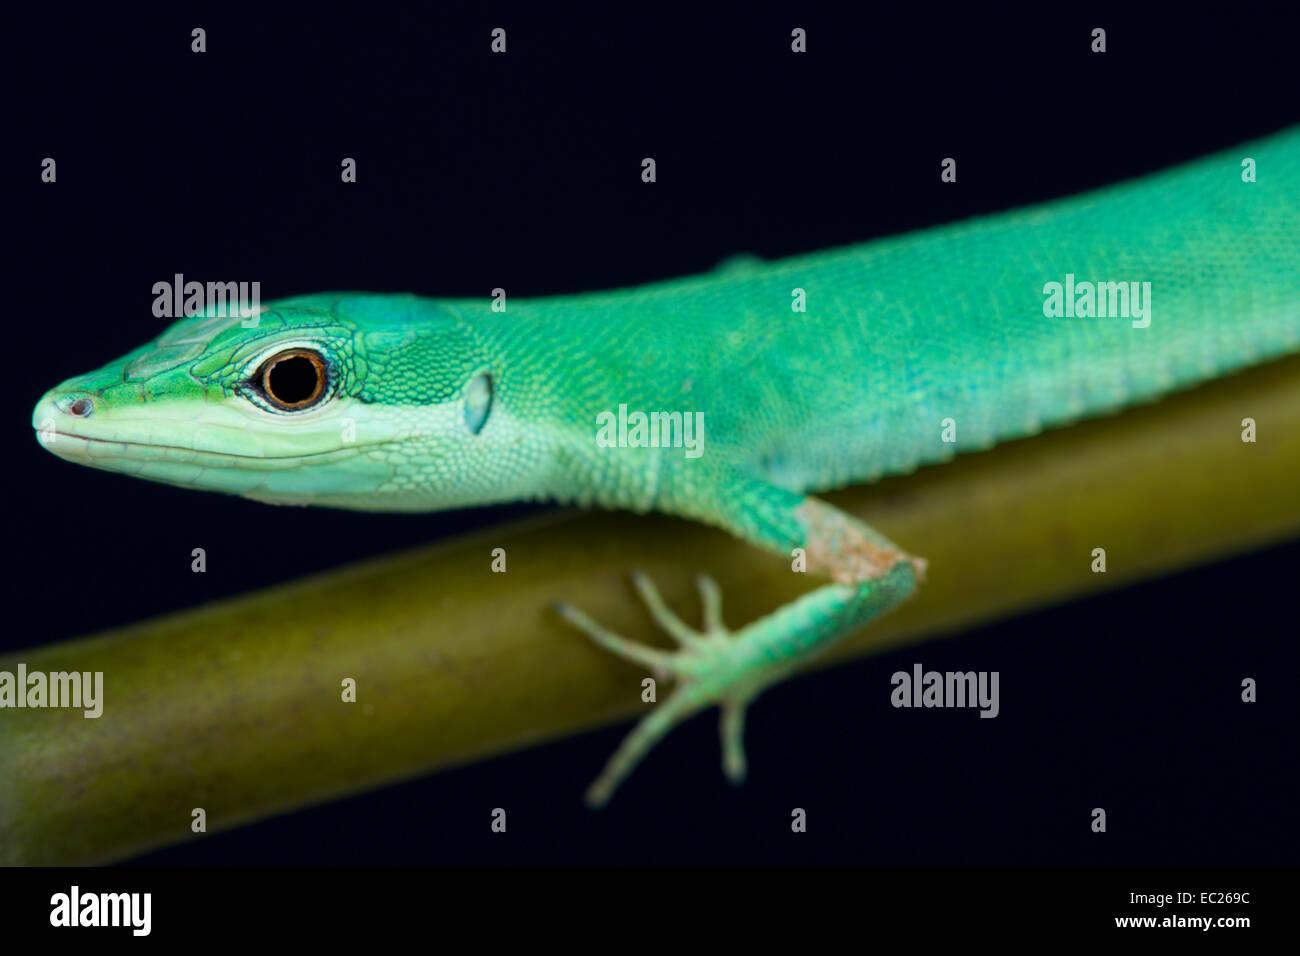 Emerald grass lizard / Takydromus smaragdinus - Stock Image